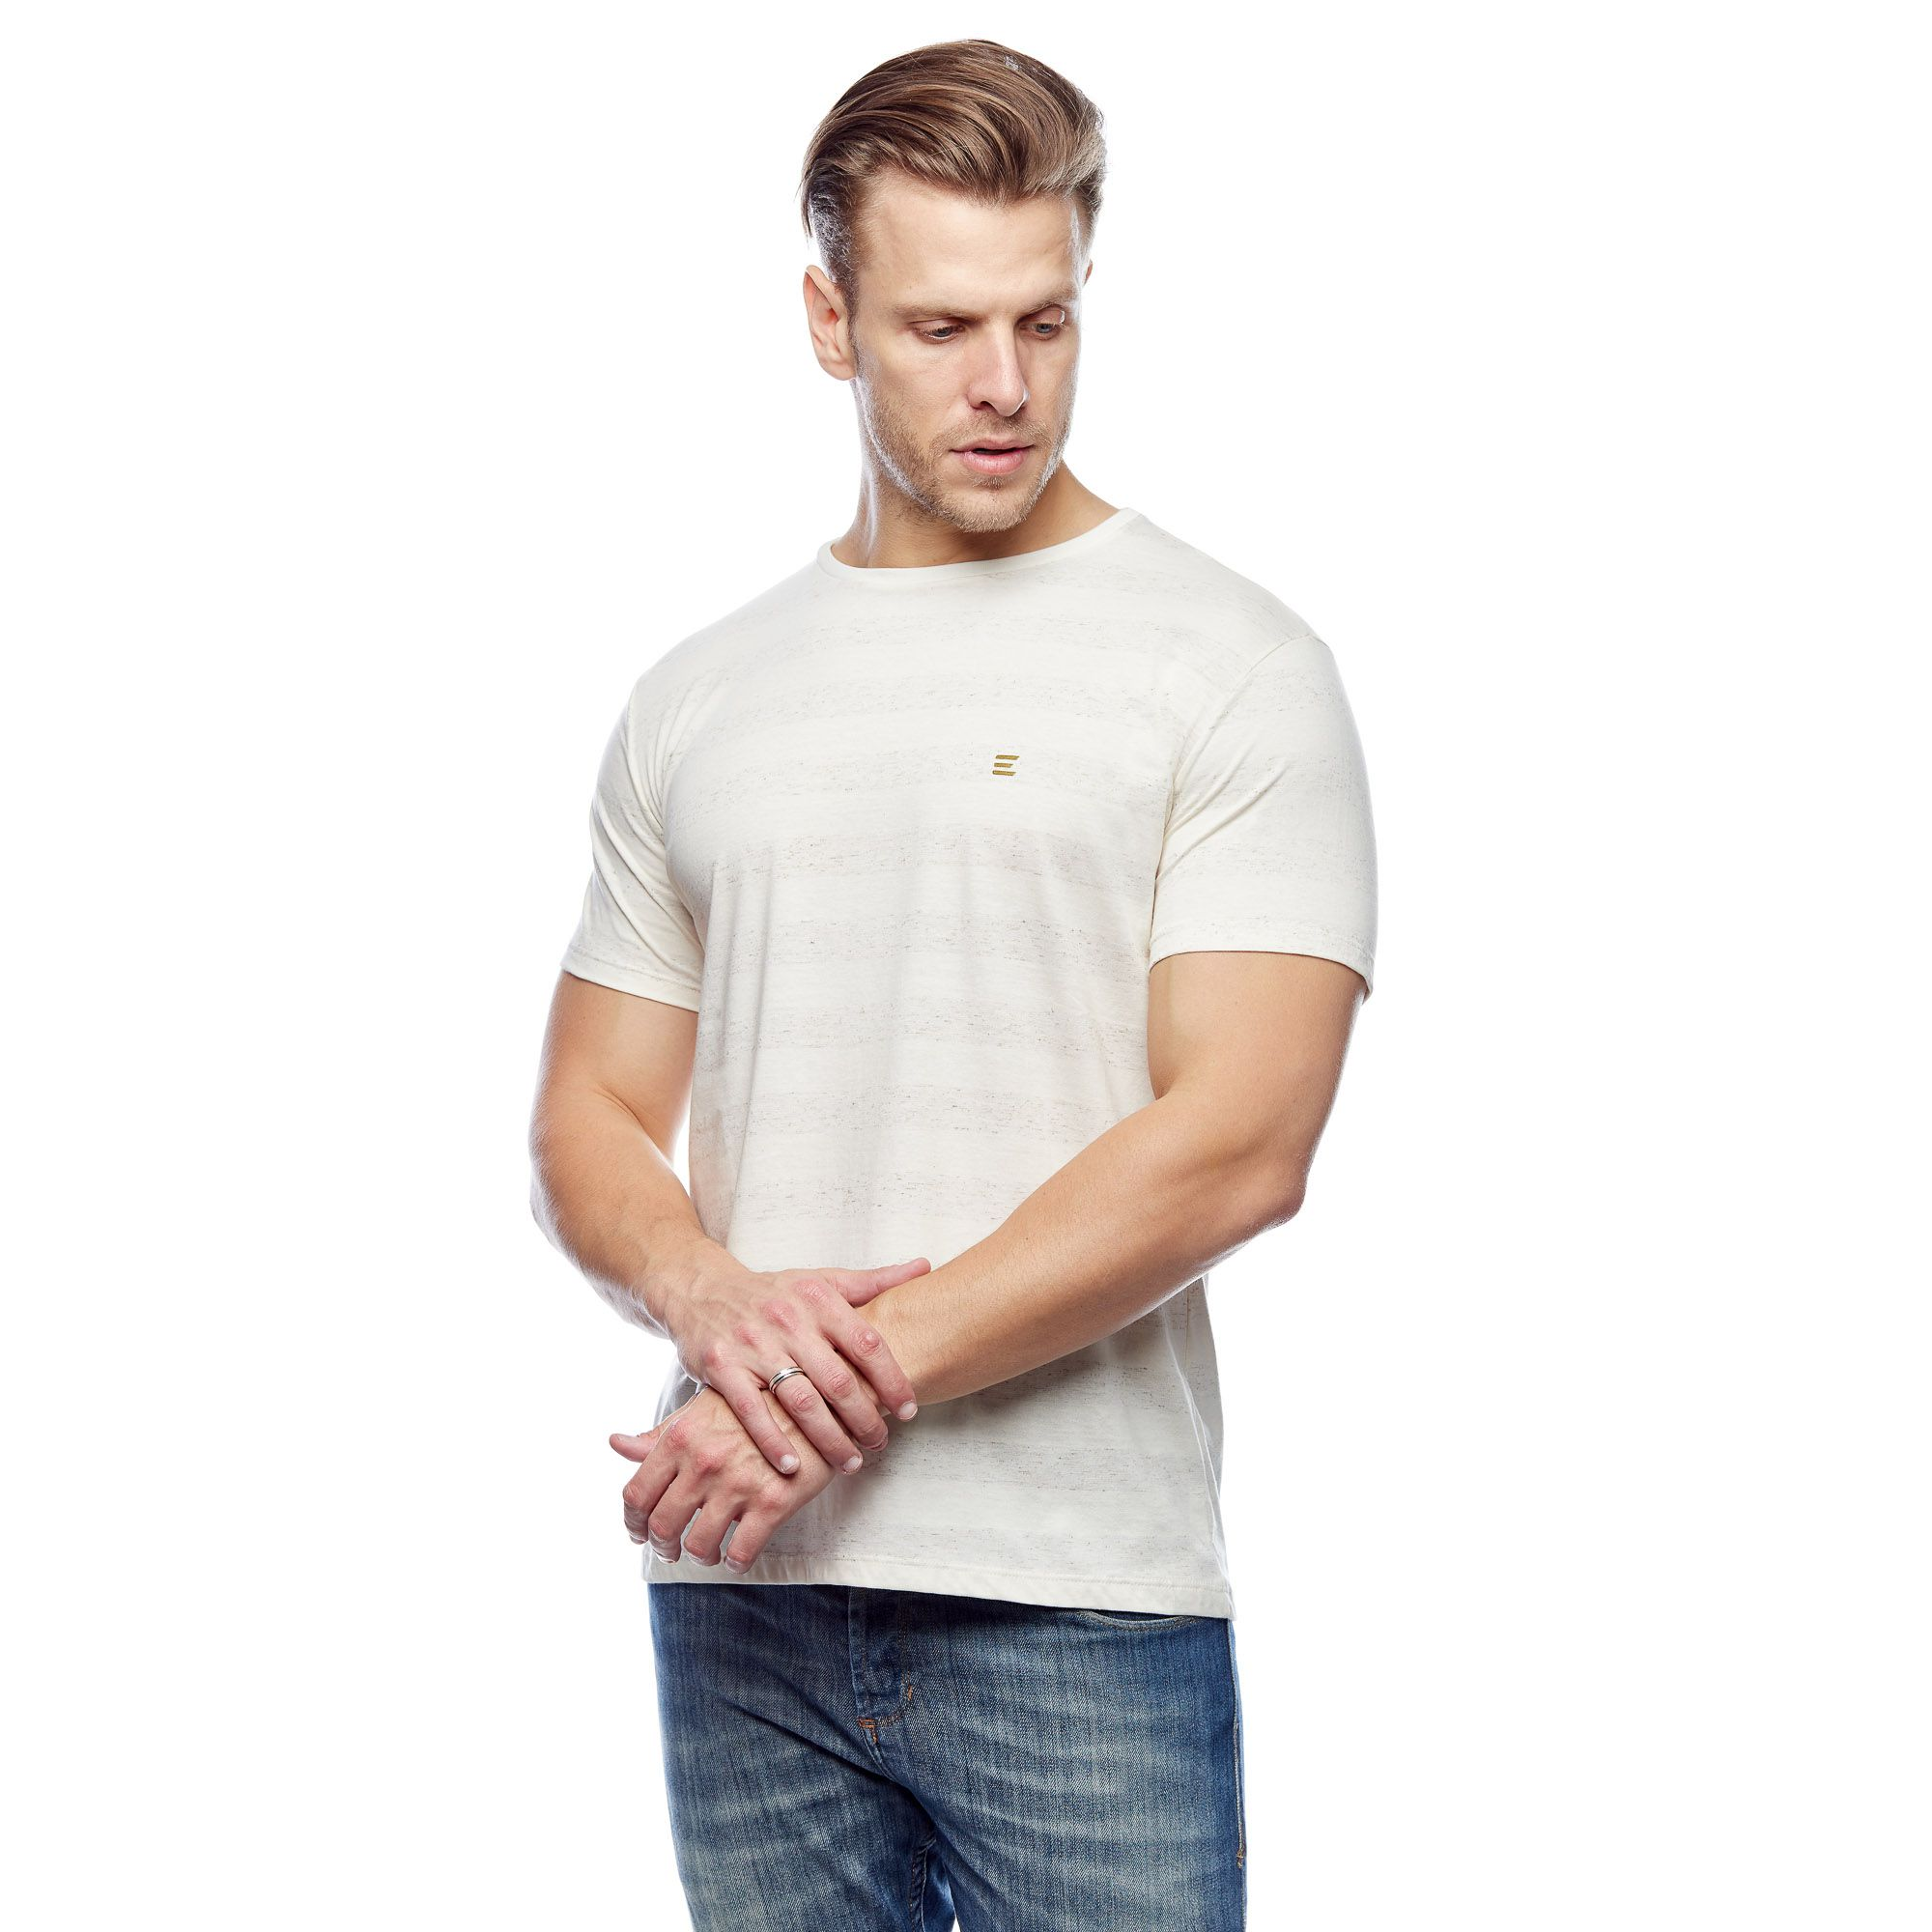 Camiseta Básica Large White Stripes Masculina Evolvee